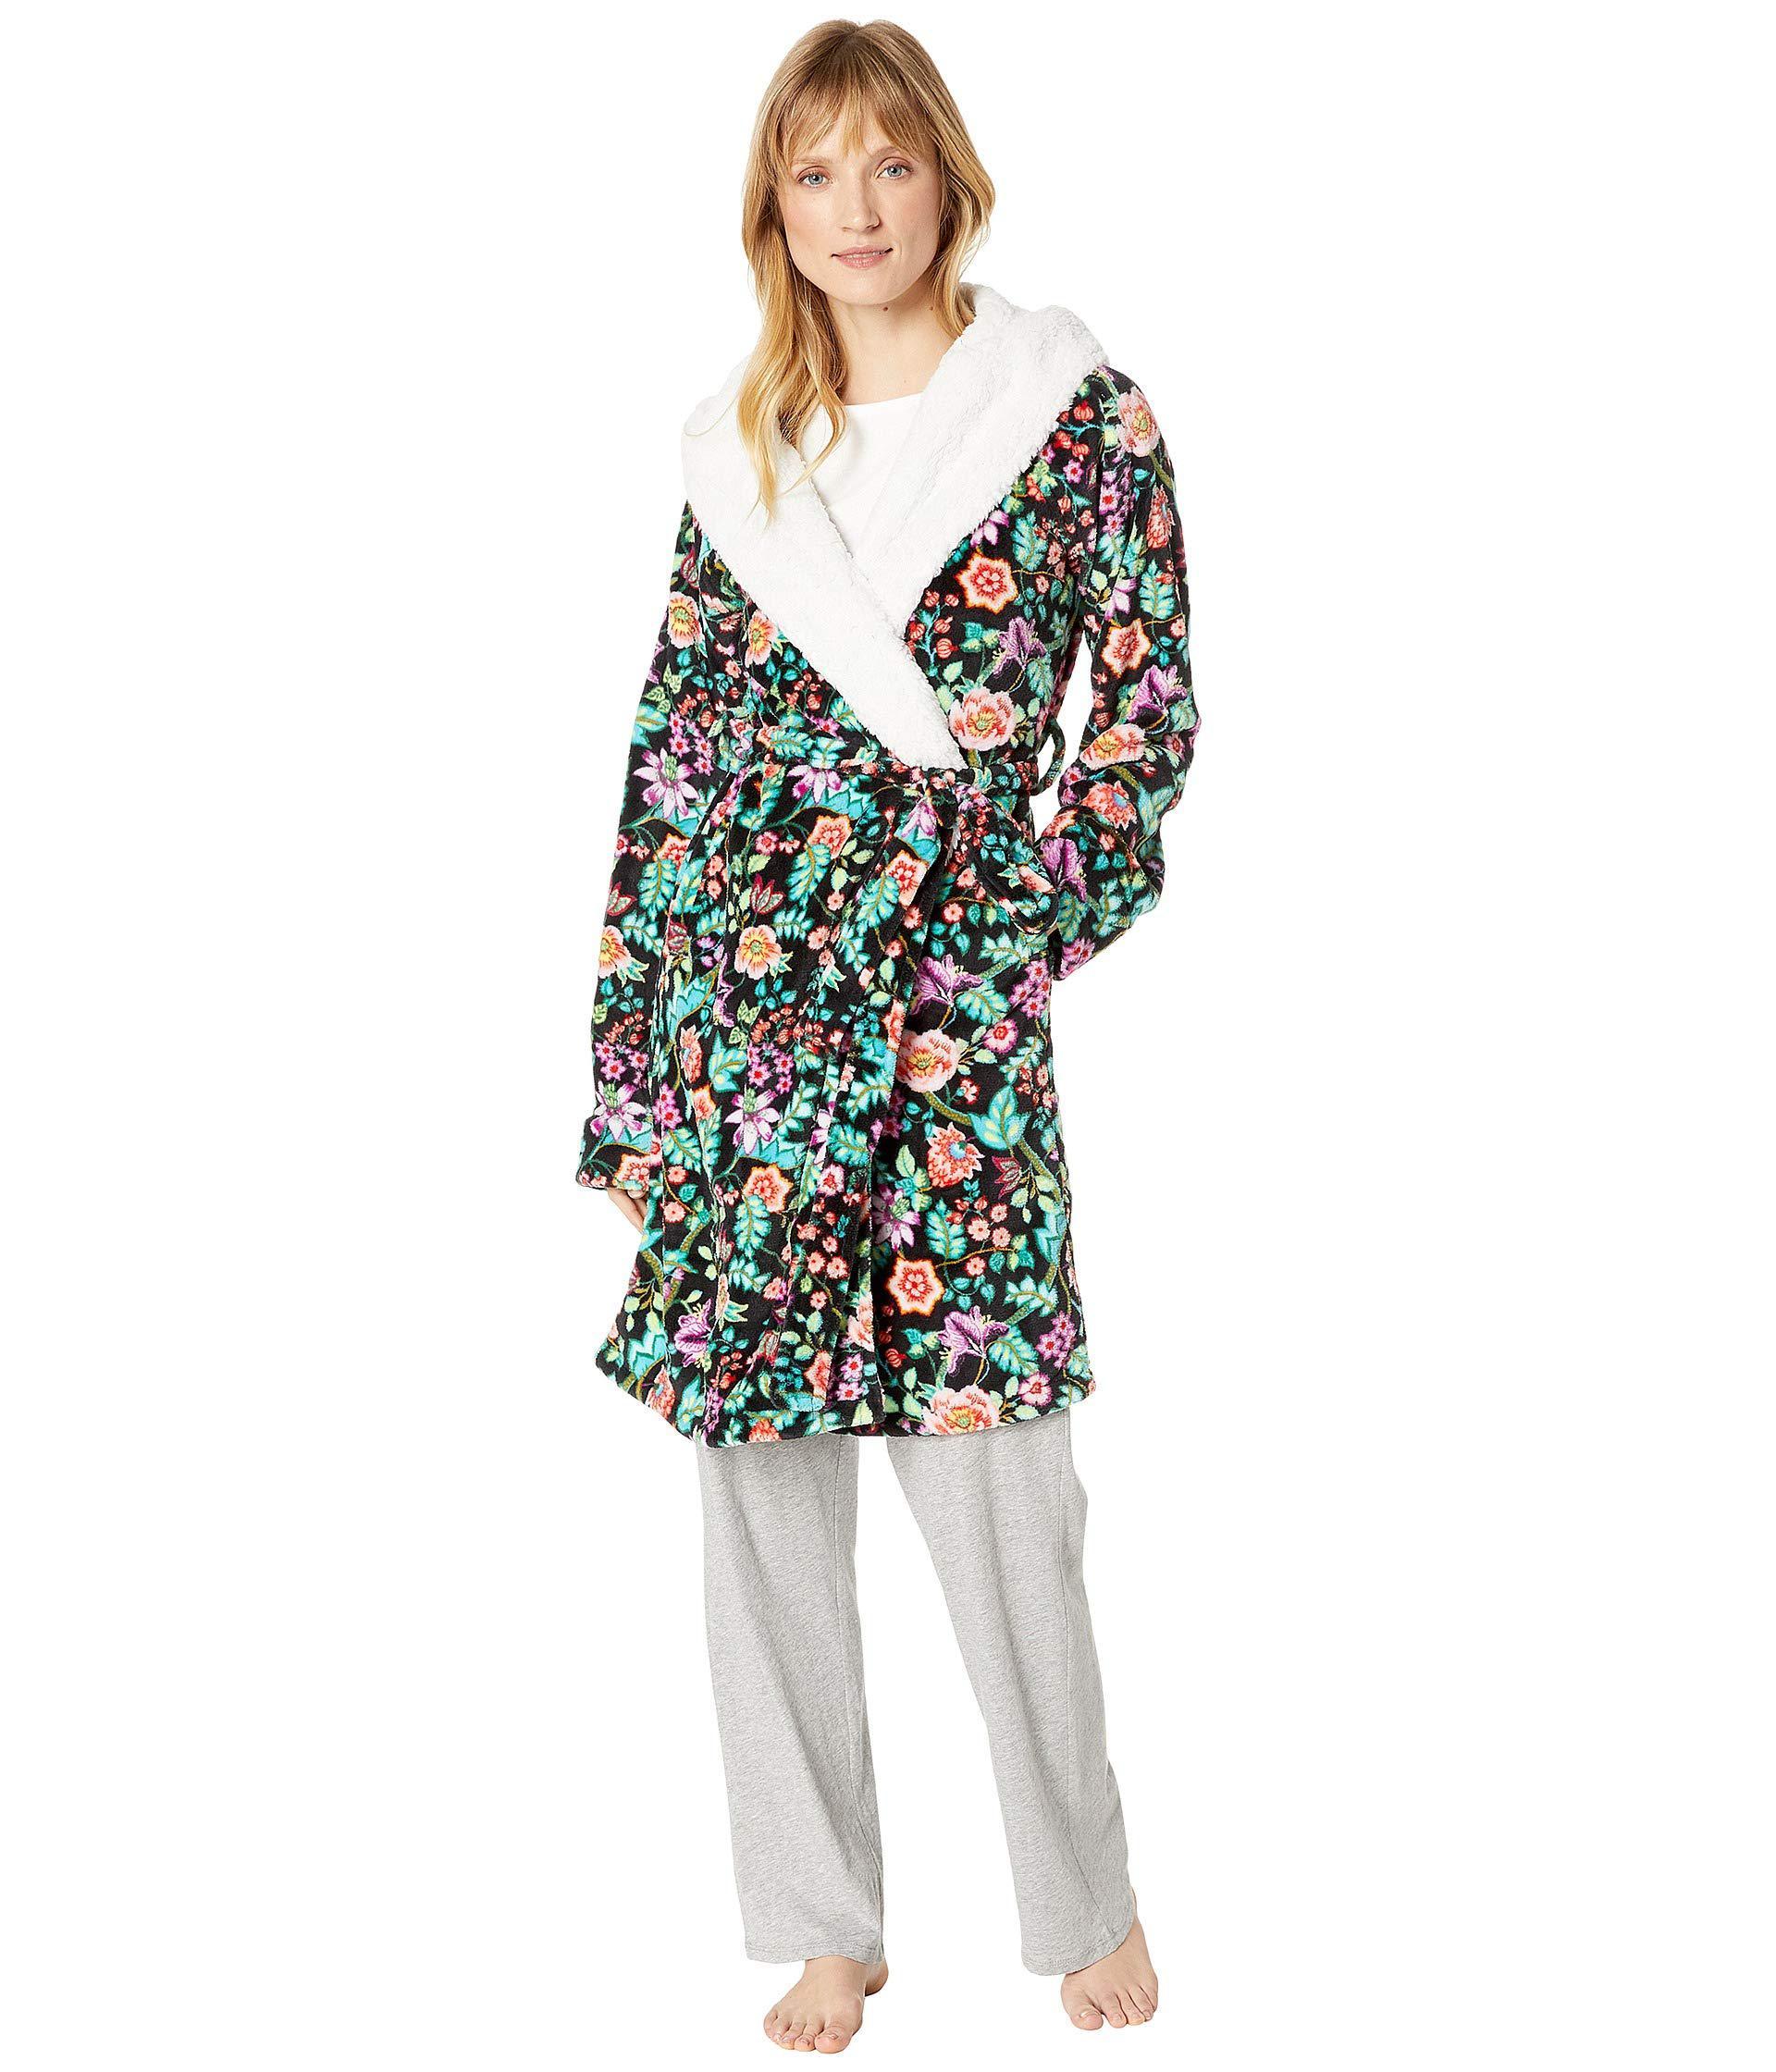 6db8e9622f Lyst - Vera Bradley Hooded Fleece Robe (vines Floral) Women s Robe